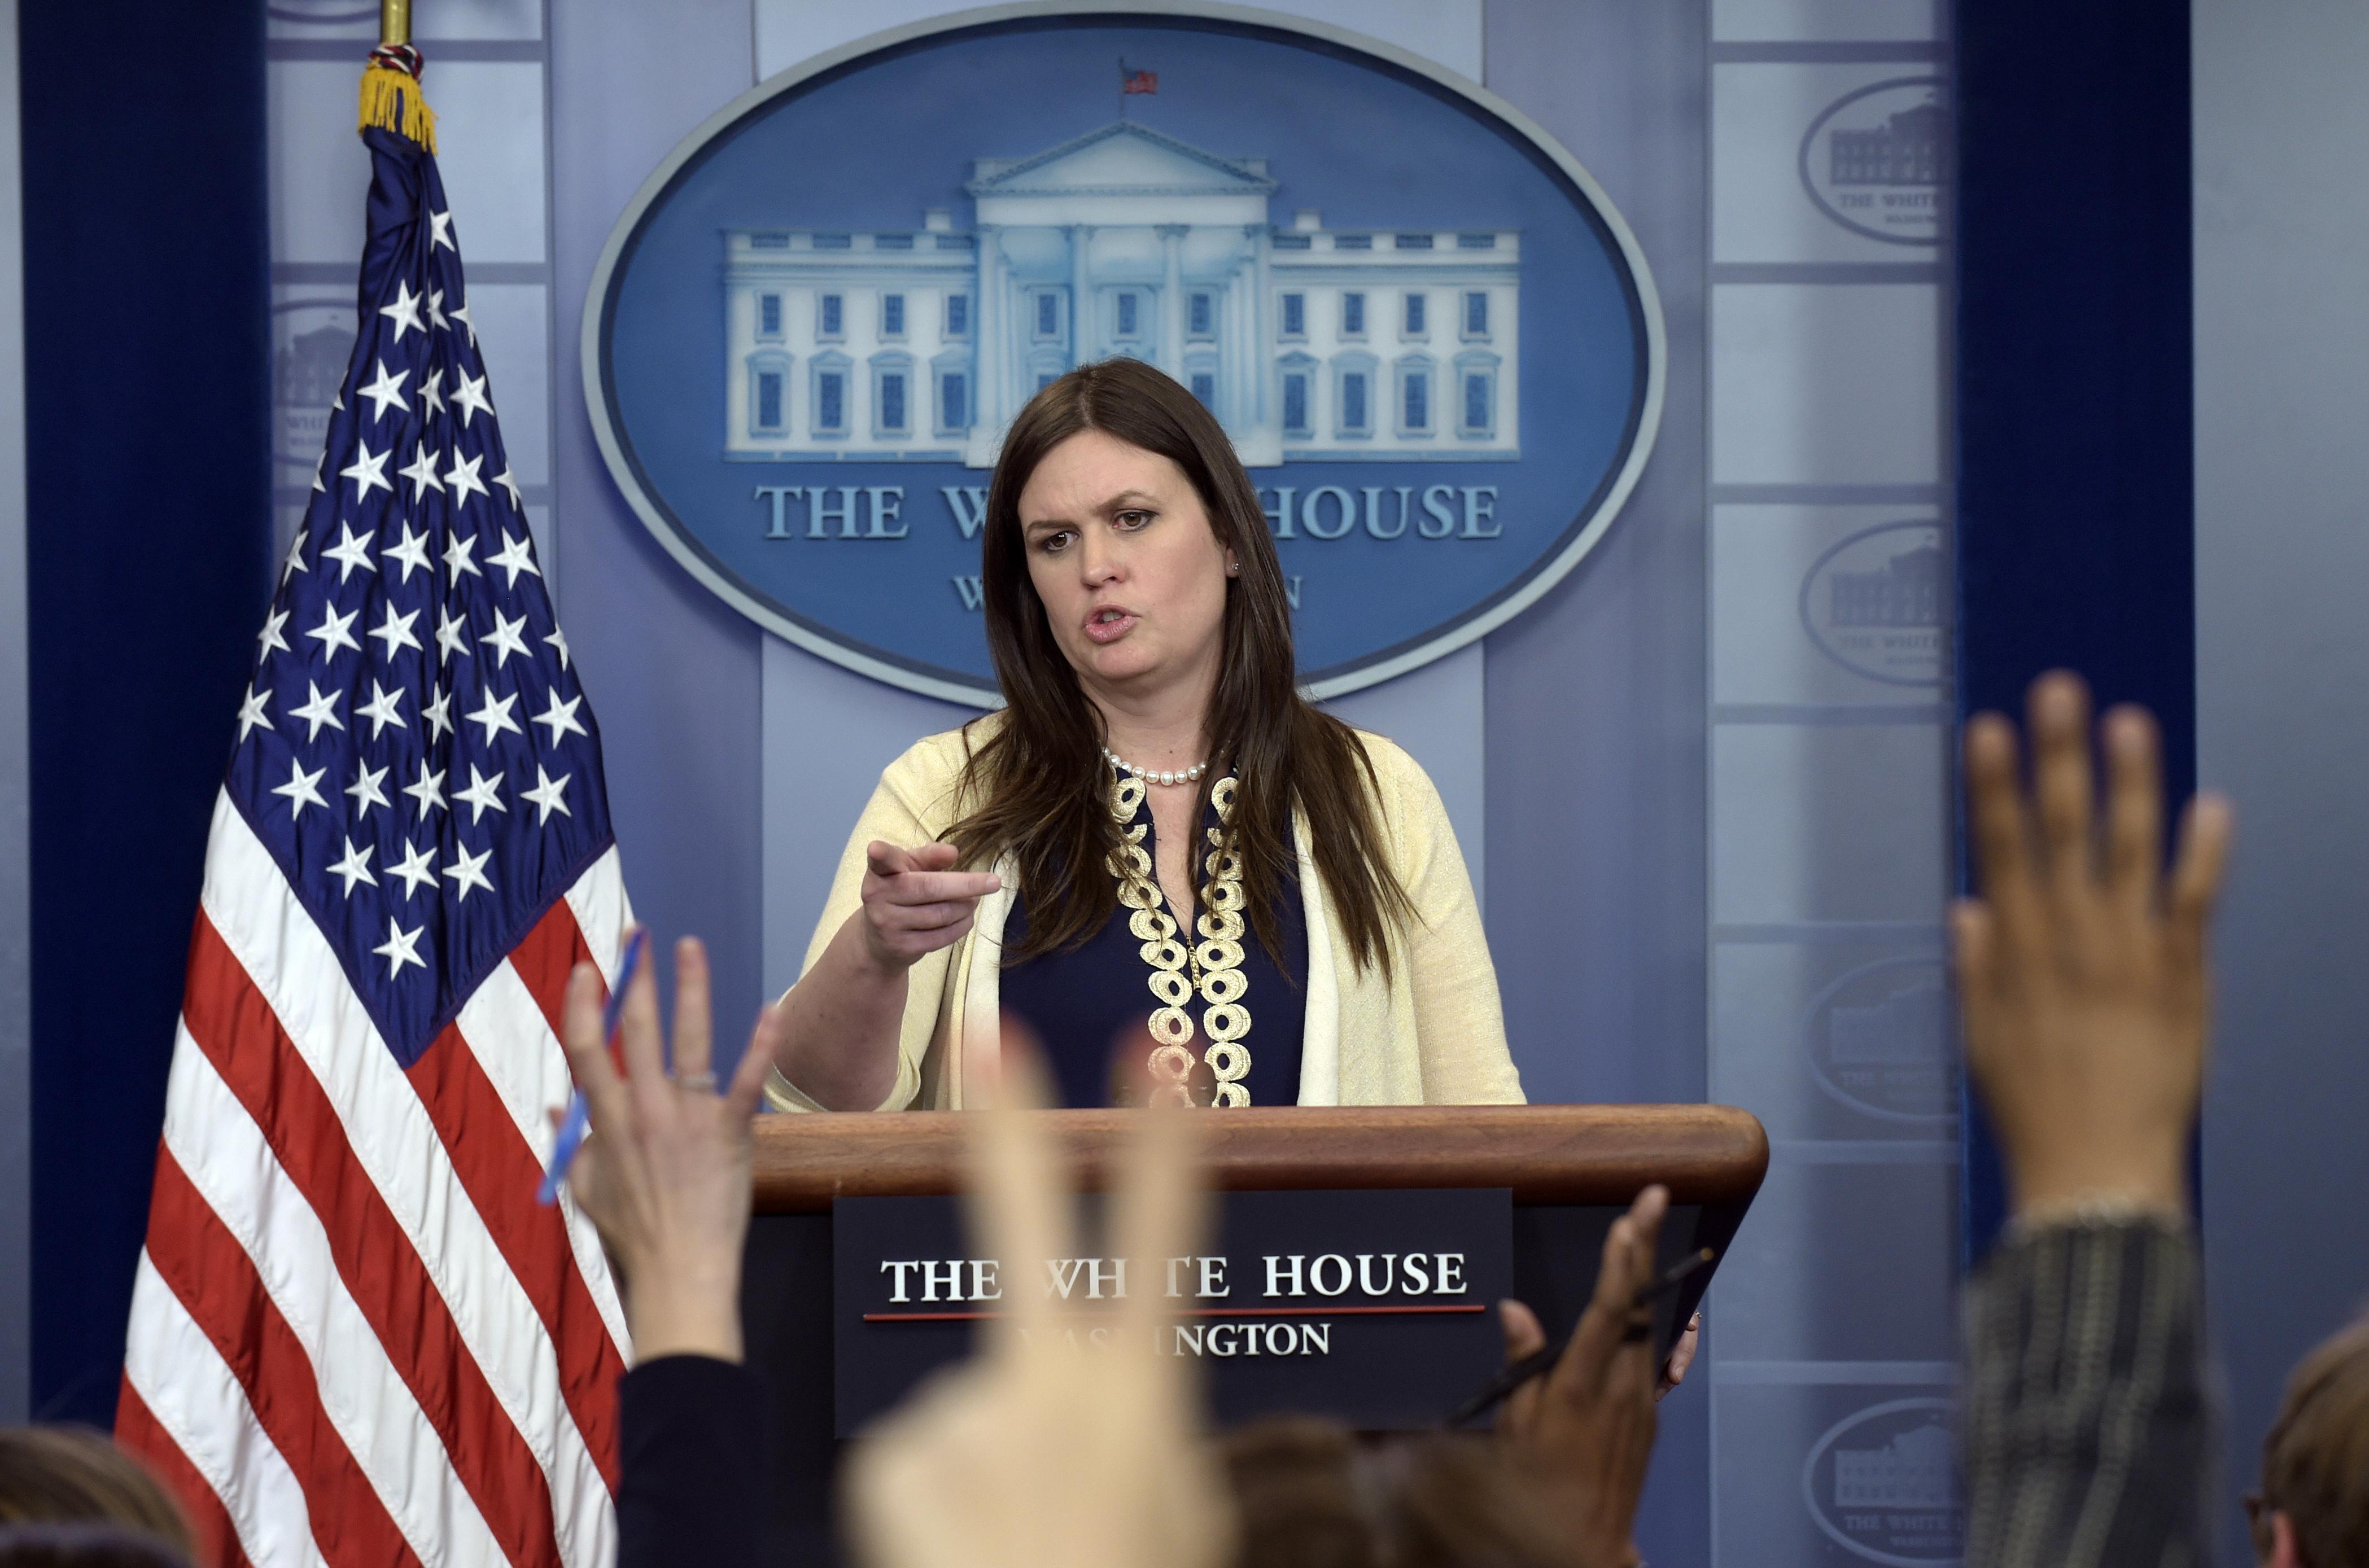 Image result for White House spokeswoman Sarah Huckabee Sanders